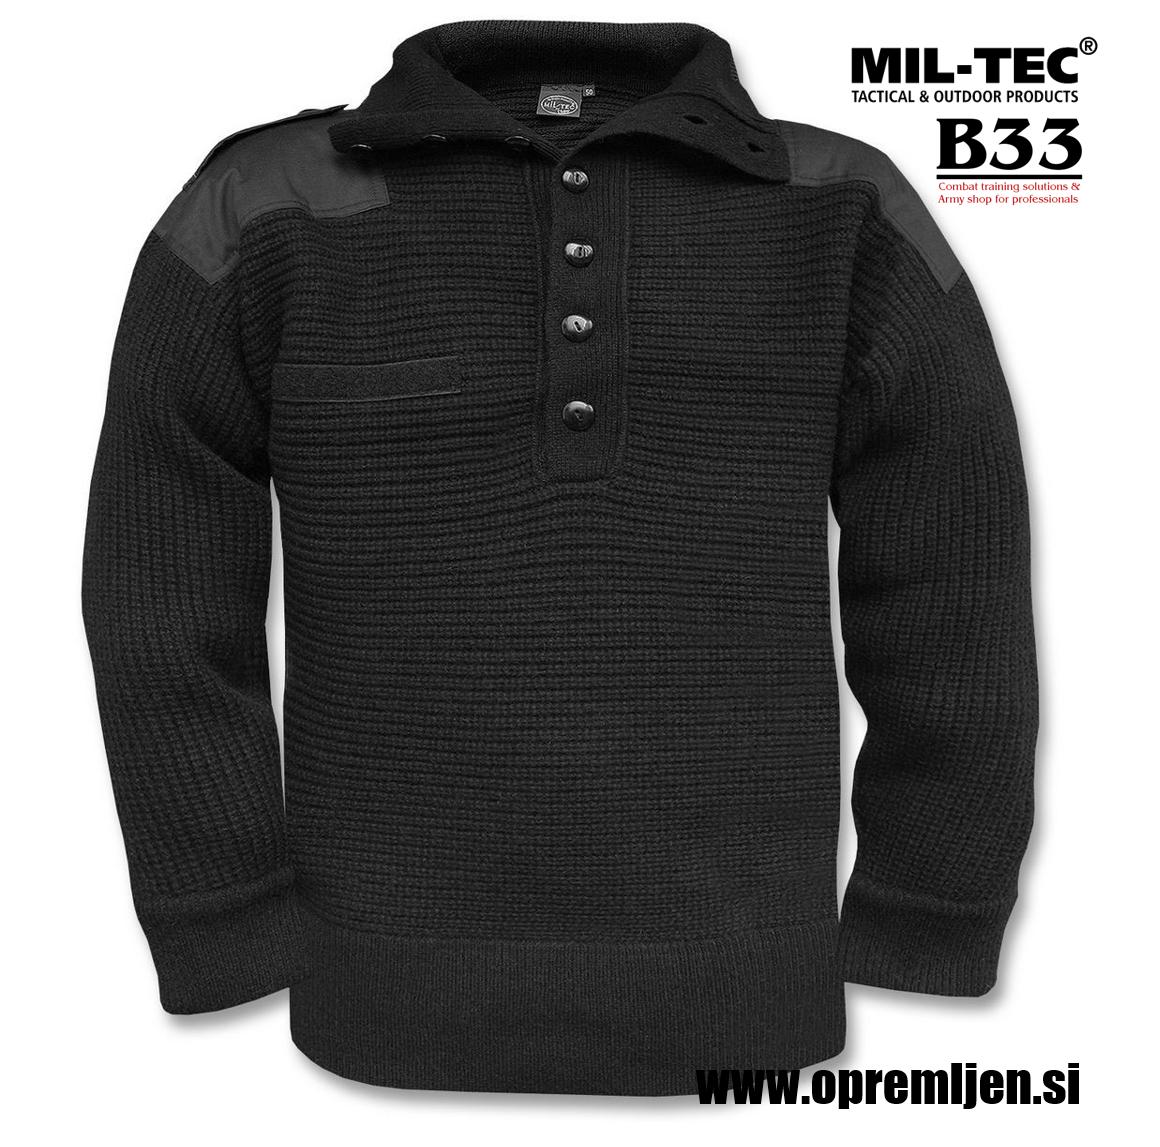 B33 army shop - Alpski vojaški pulover iz volne, volneni vojaški pulover, vojaški pulover 100% volna, lovski pulover